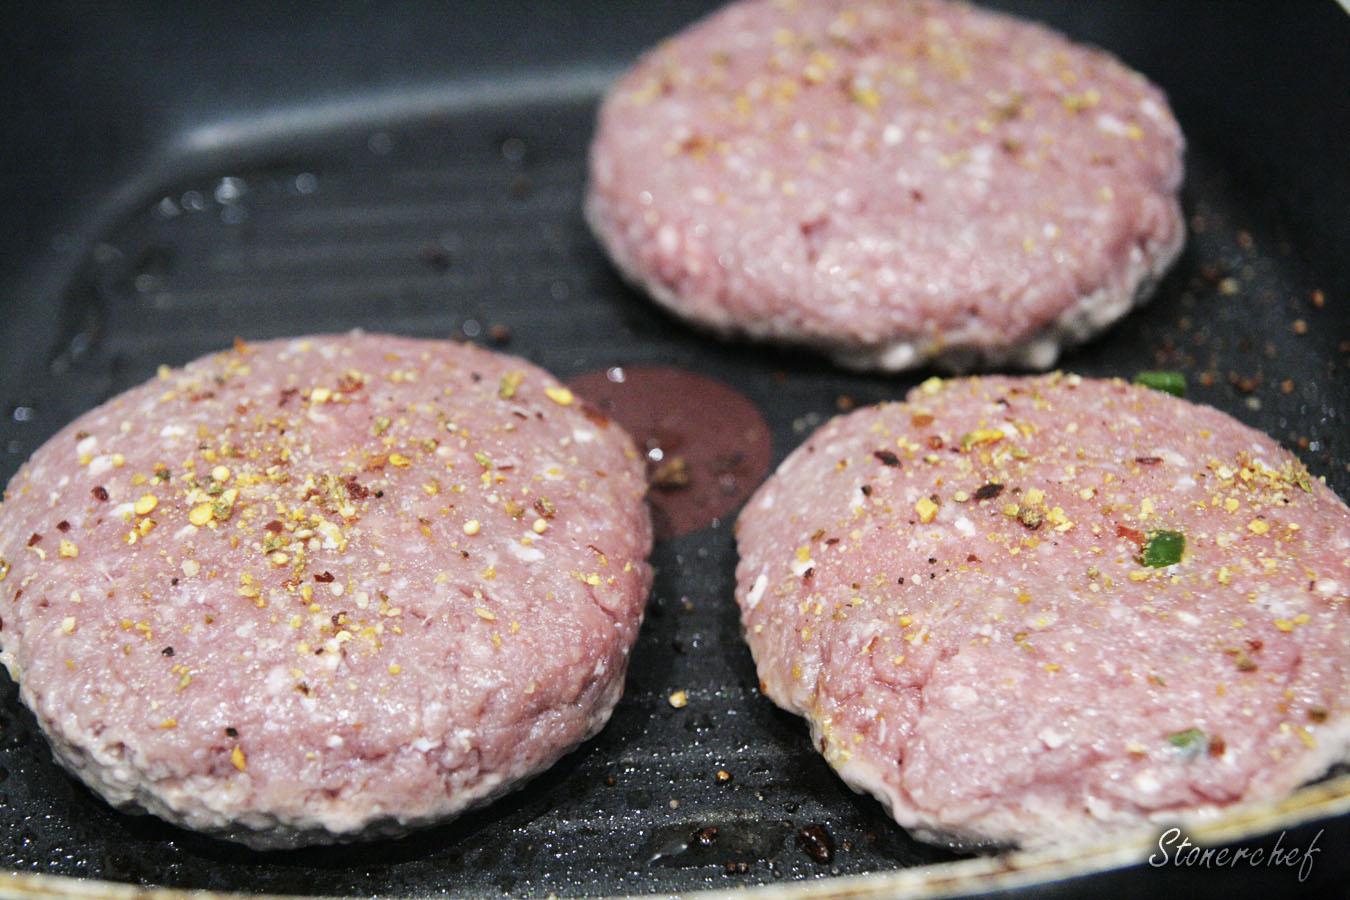 burgery na patelni grillowej